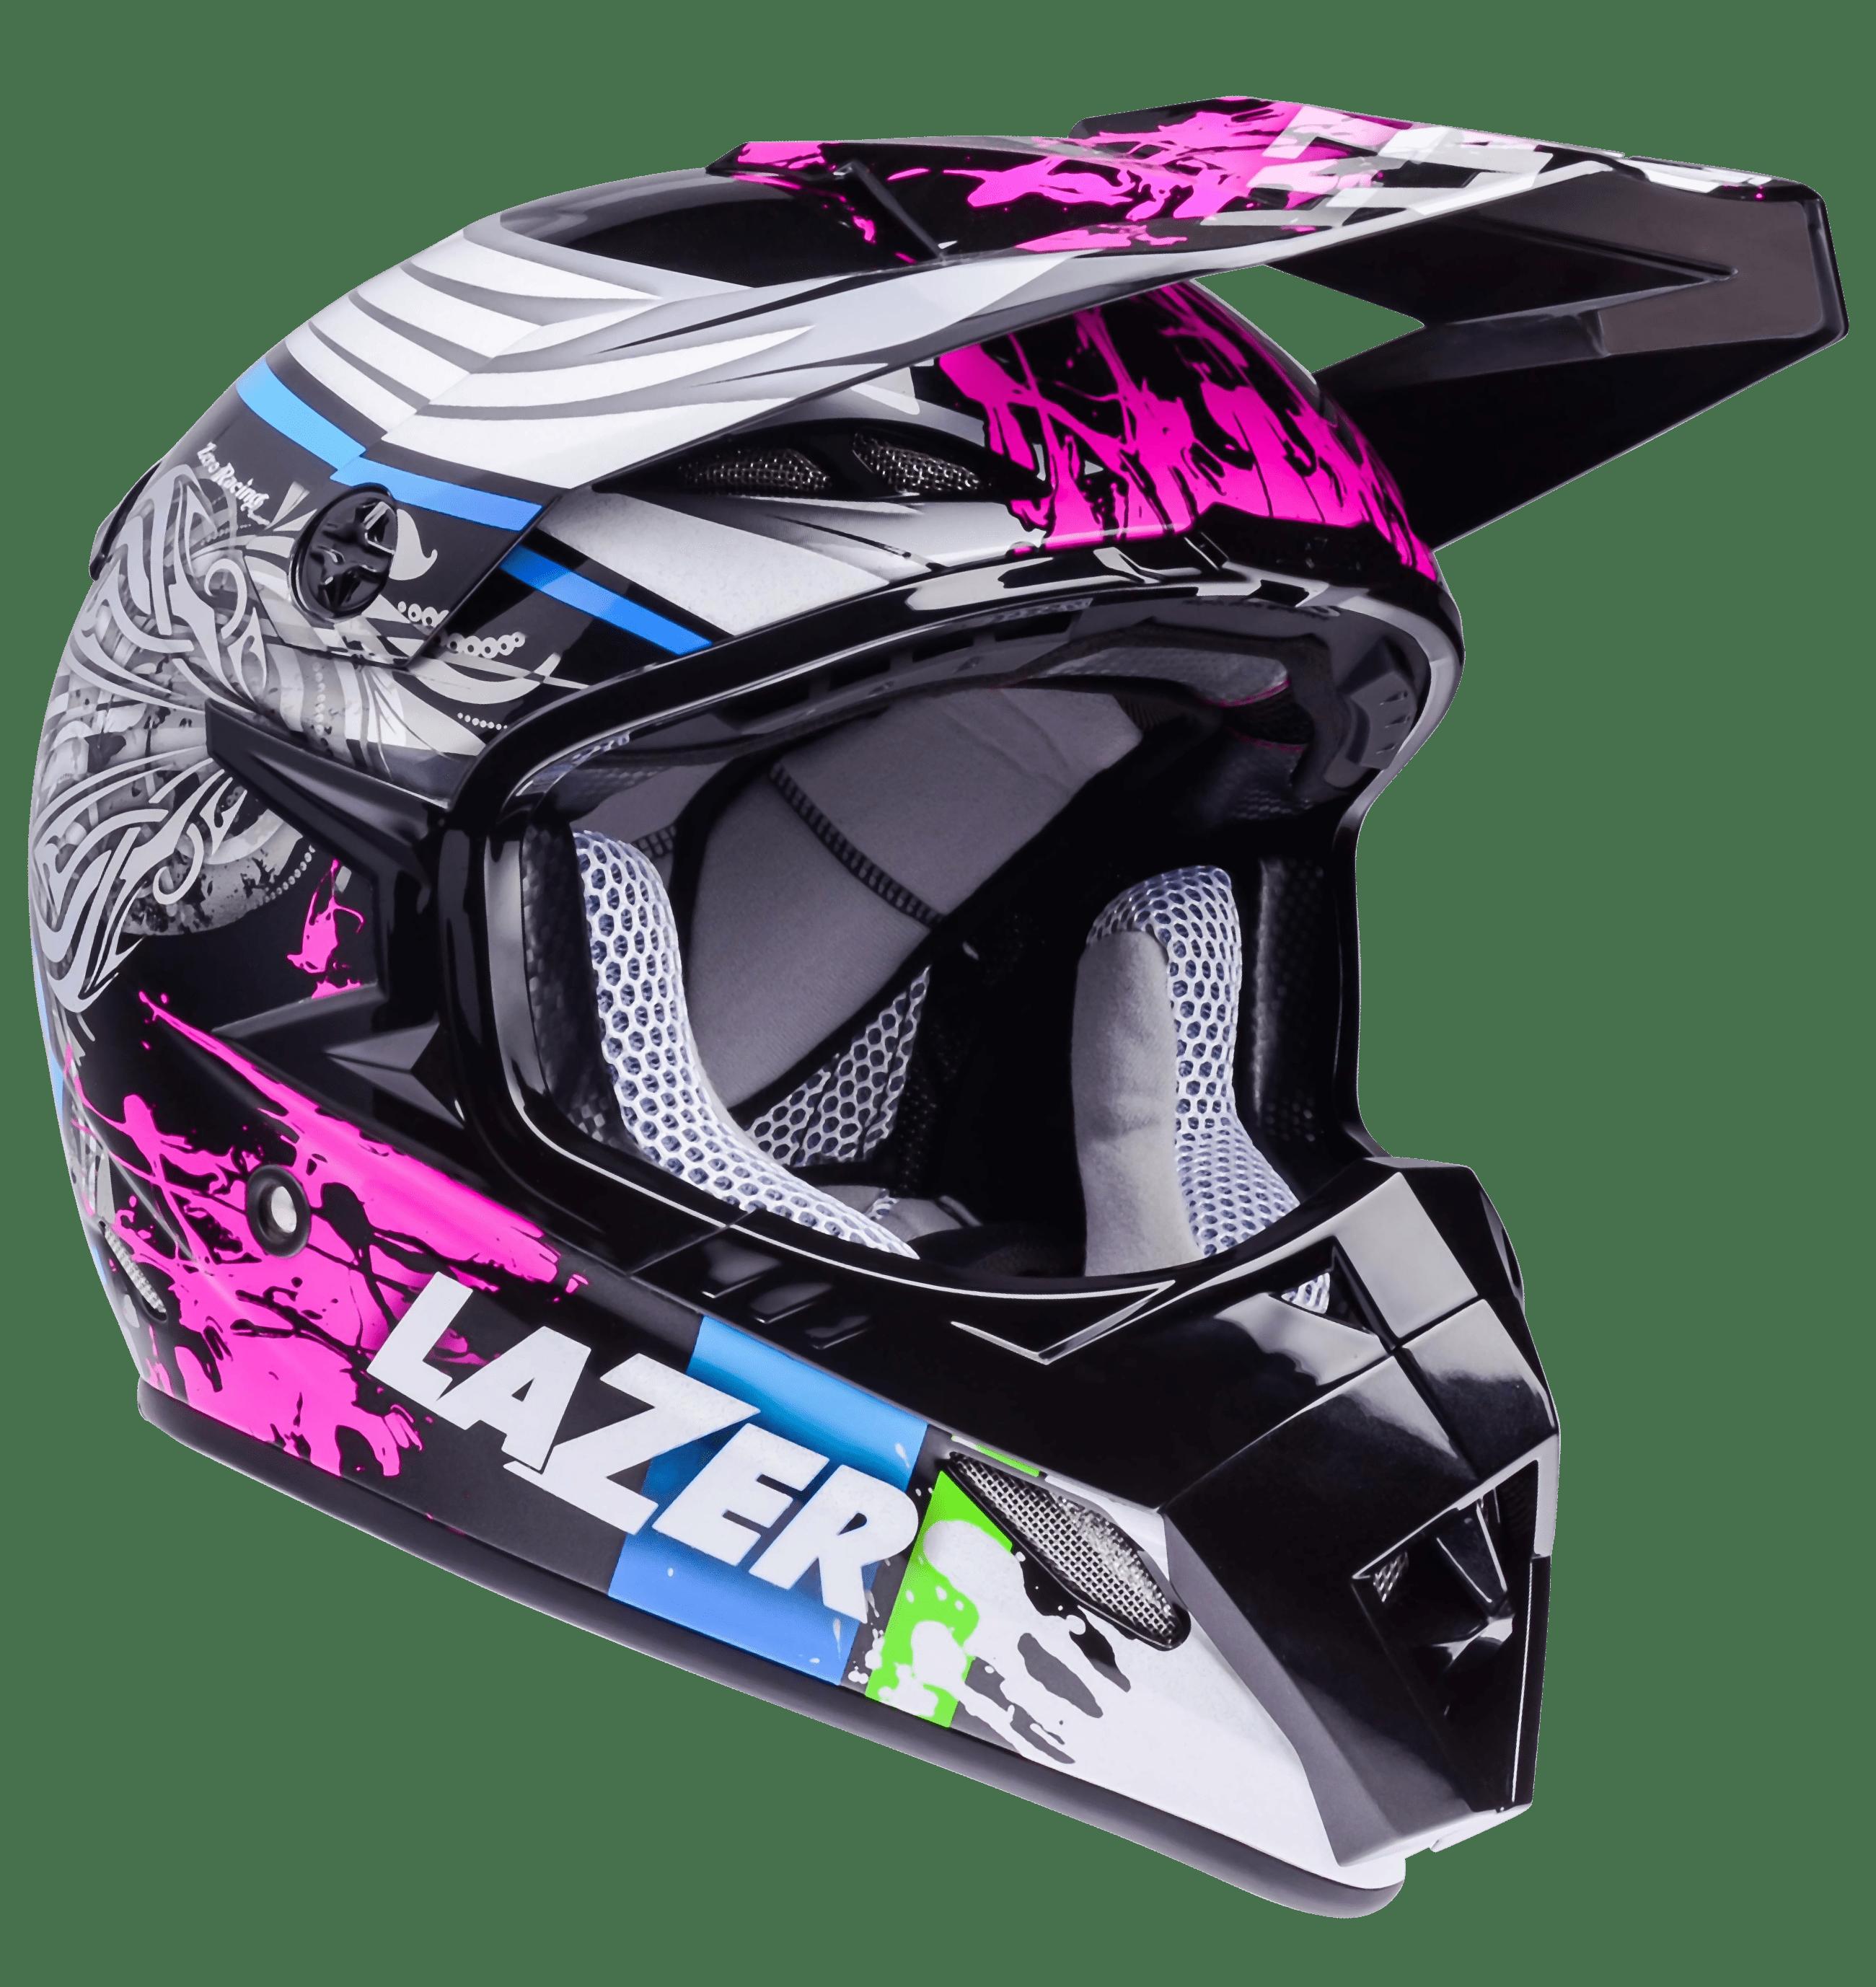 Lazer mx flash pure. Helmet clipart motorcycle helmet